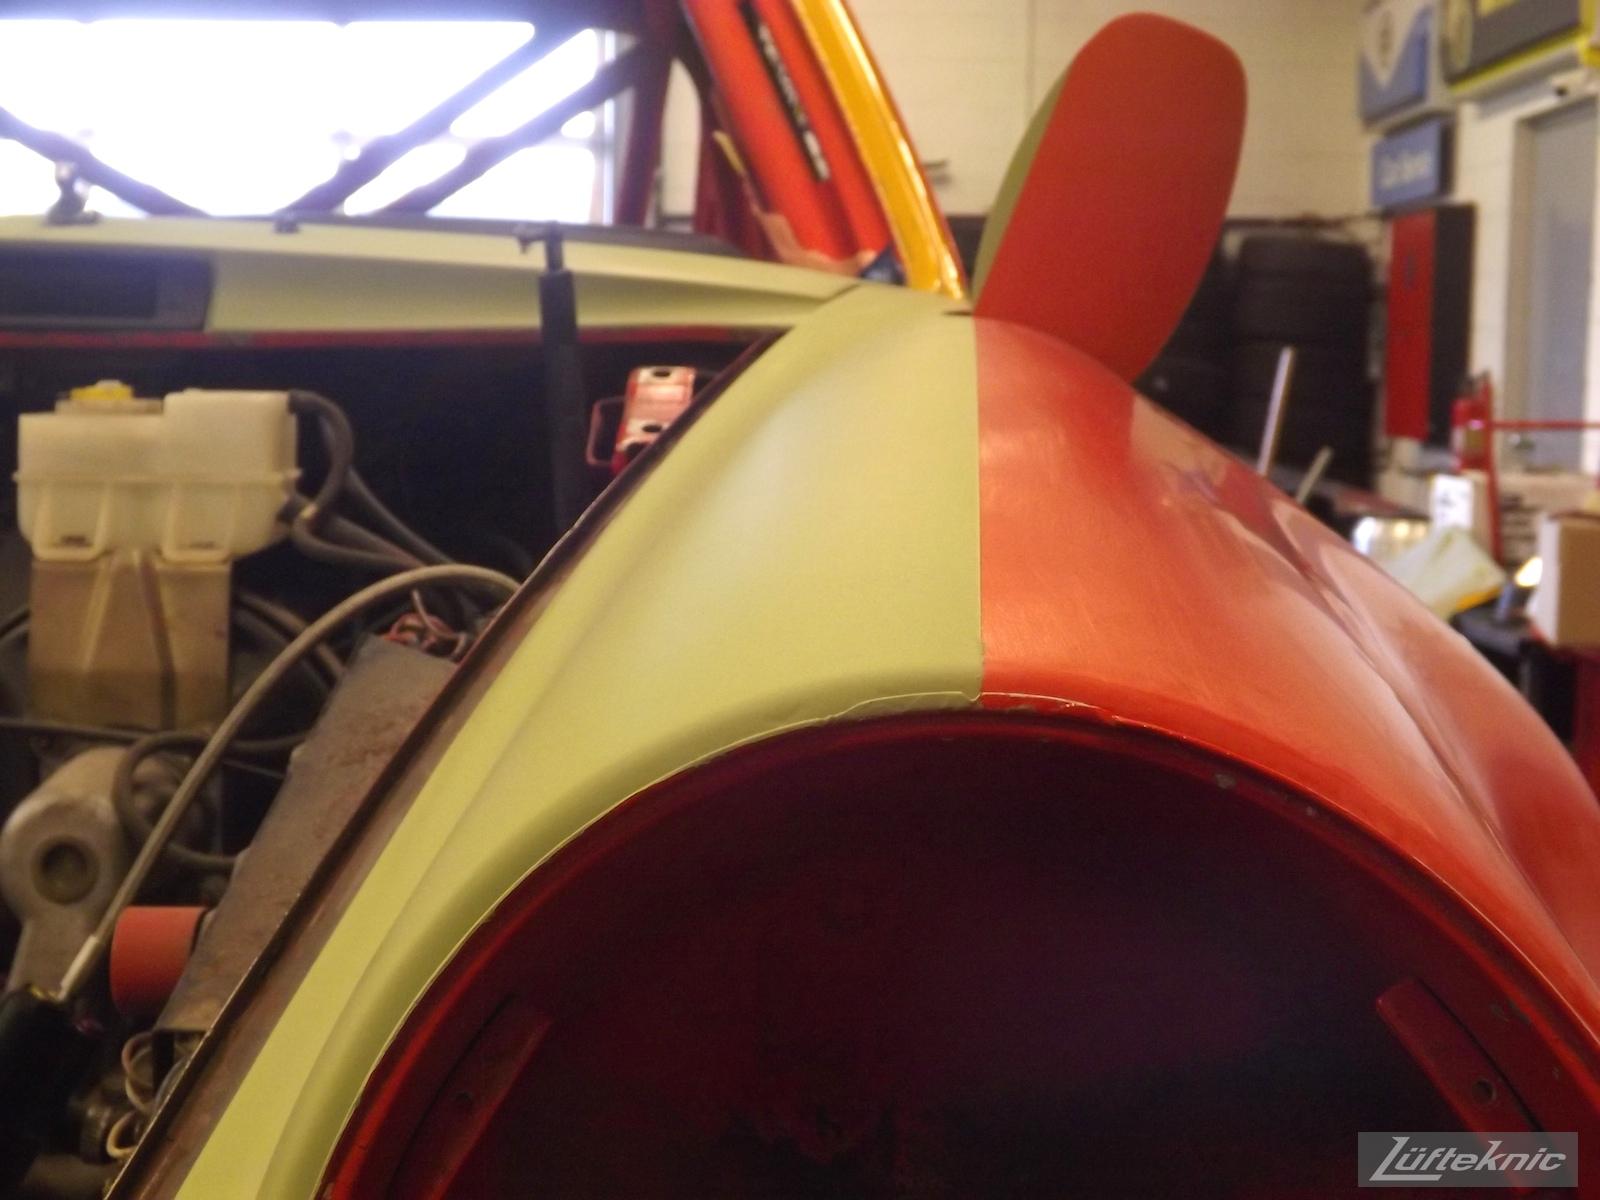 paint line on a fender of projectstuka